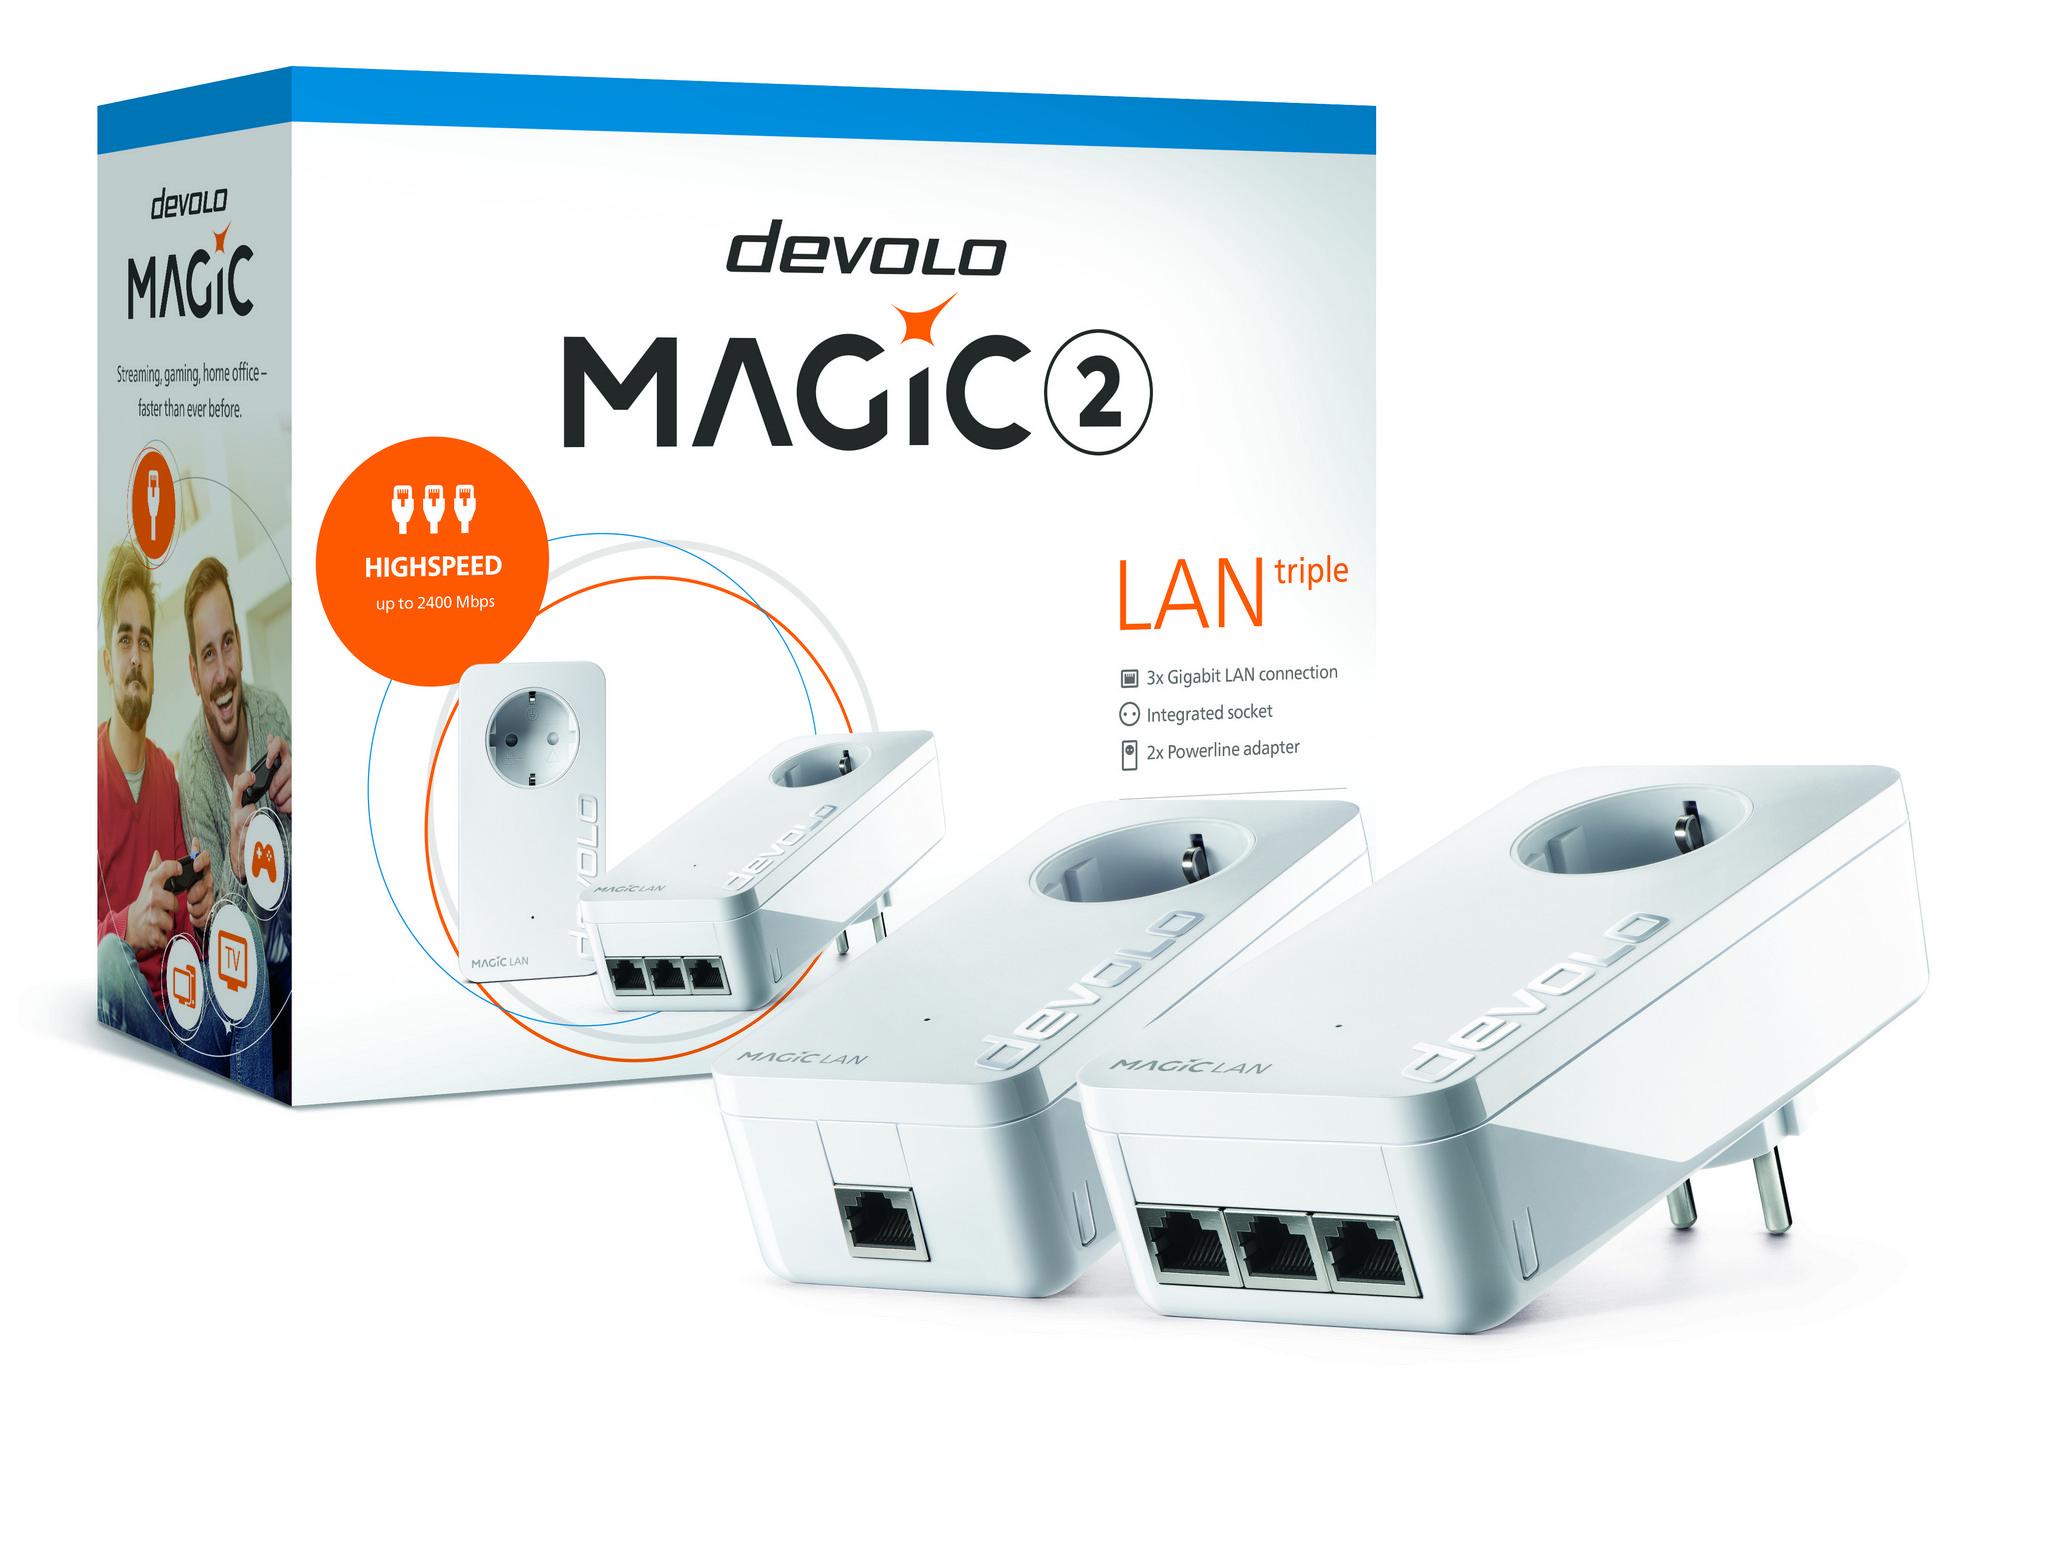 devolo Magic 2 LAN triple Starter Kit.jpg